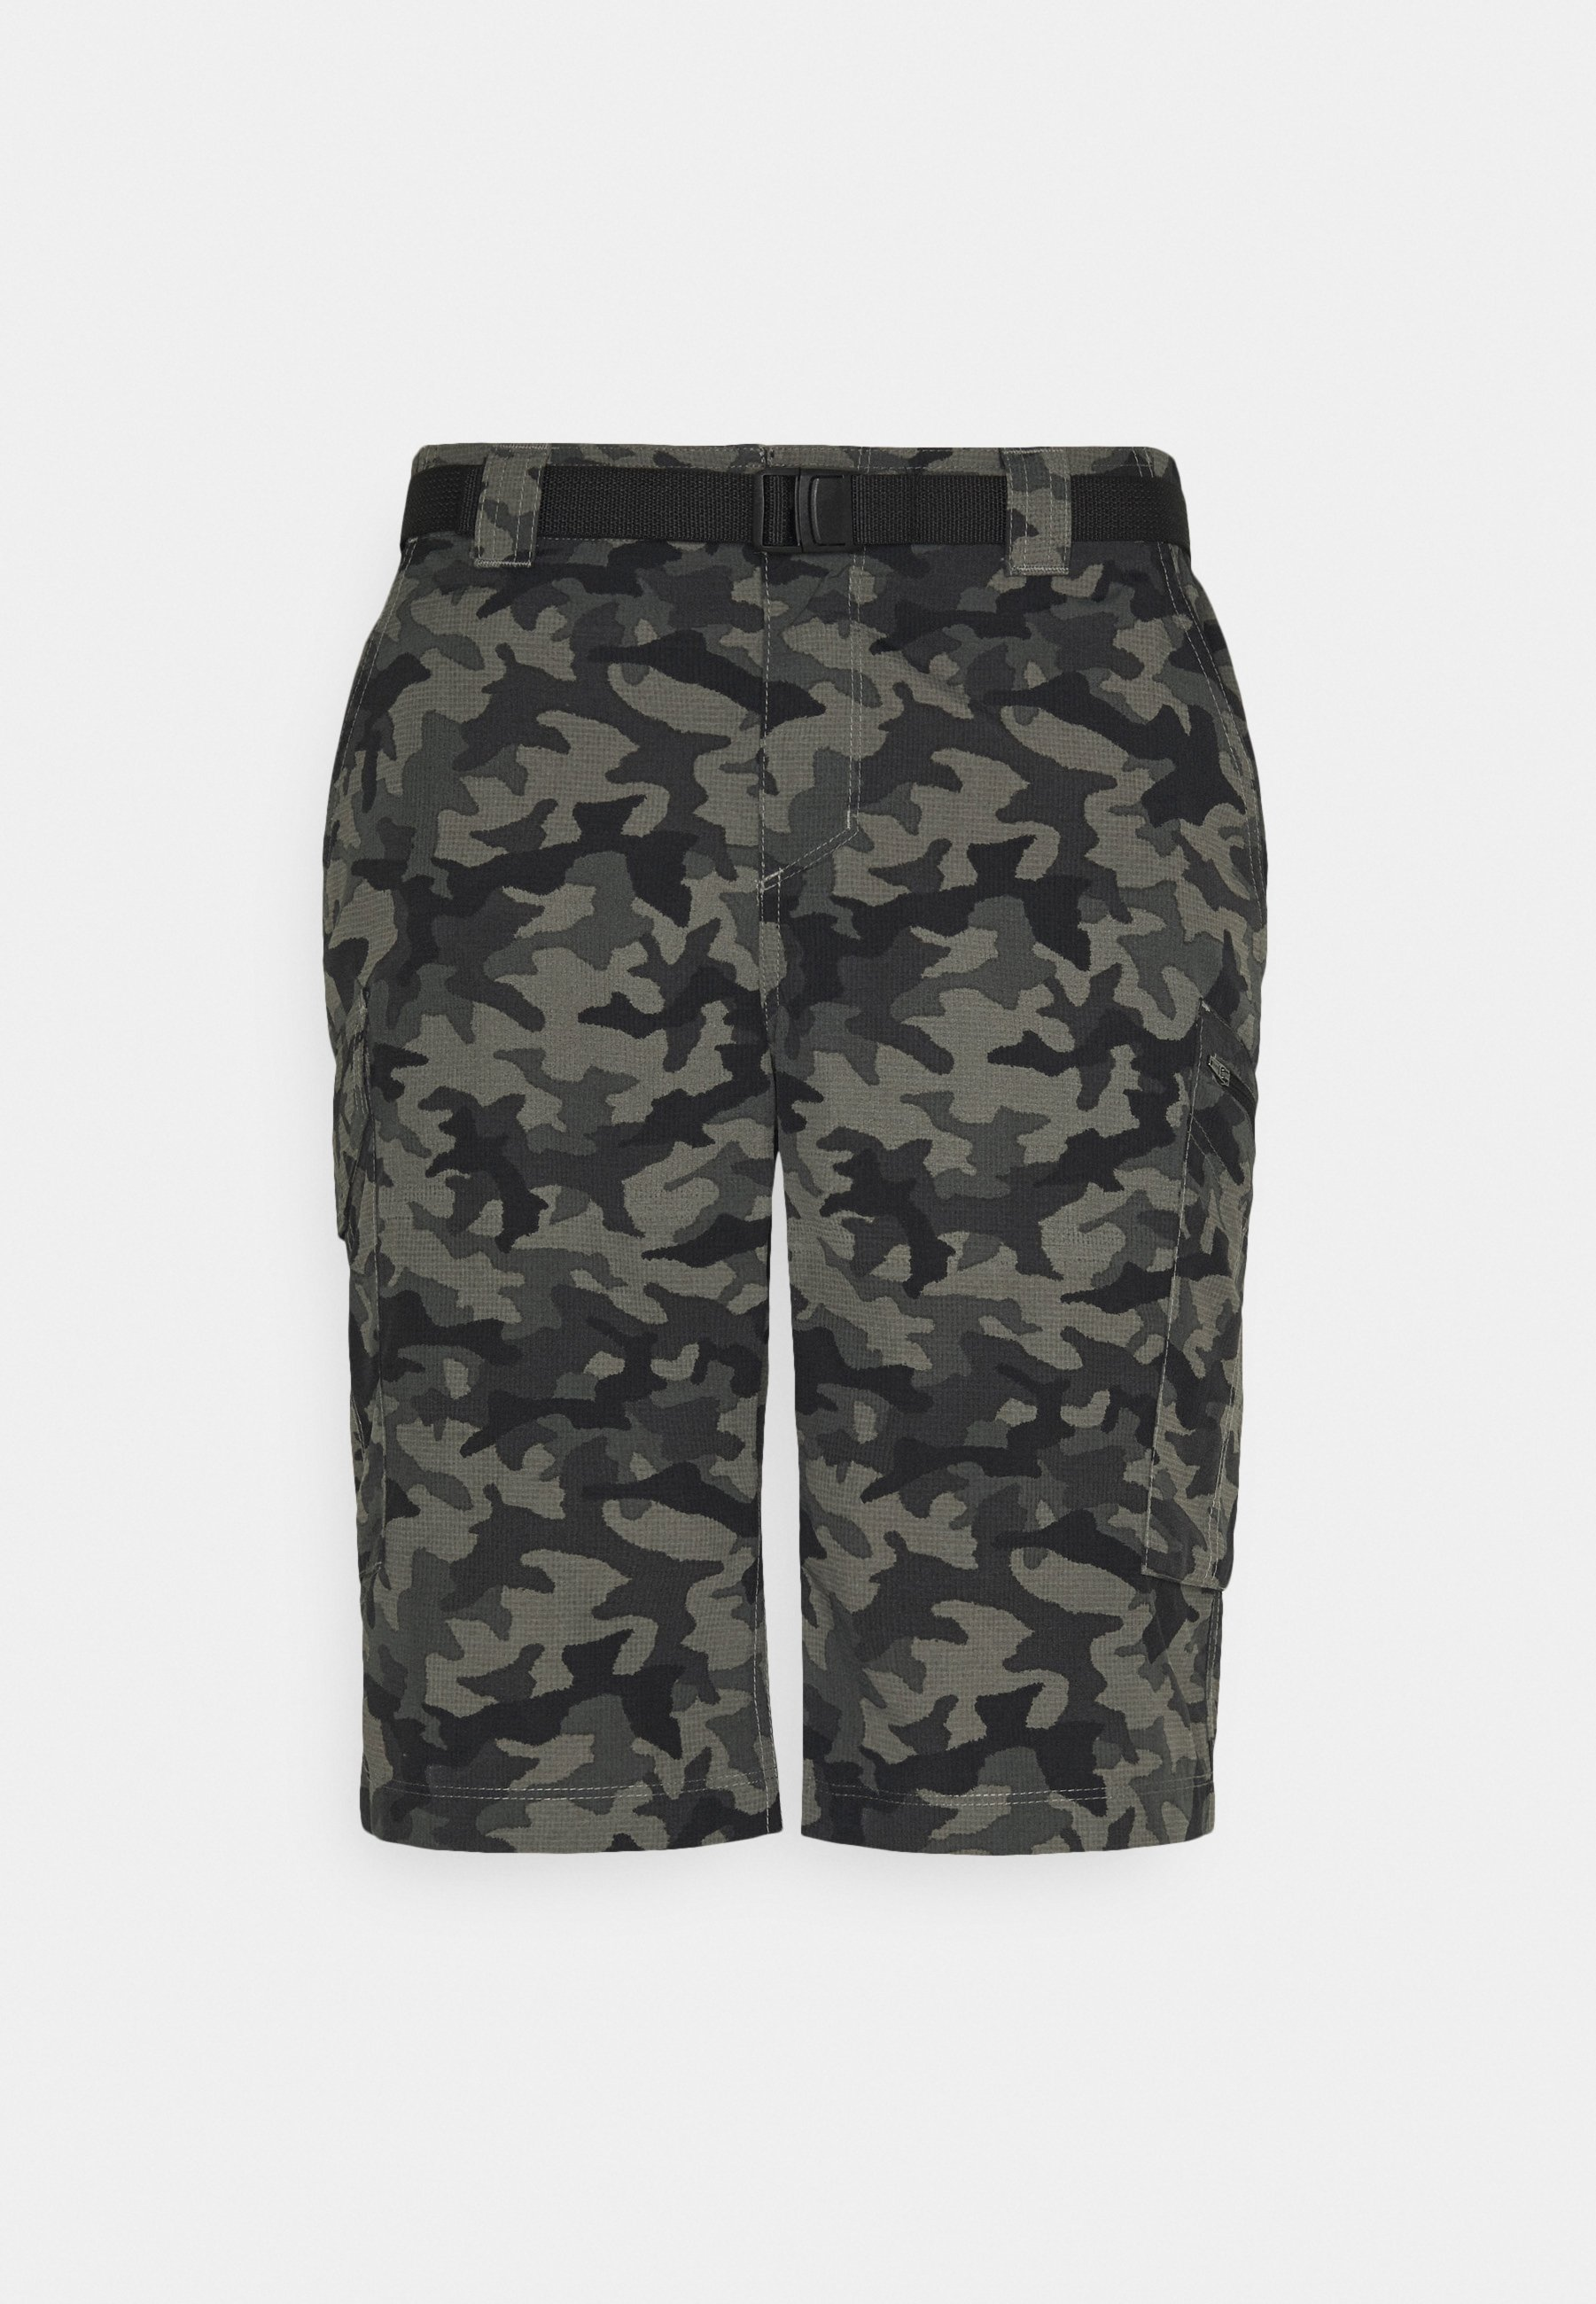 Men SILVER RIDGE™ PRINTED CARGO SHORT - Sports shorts - black